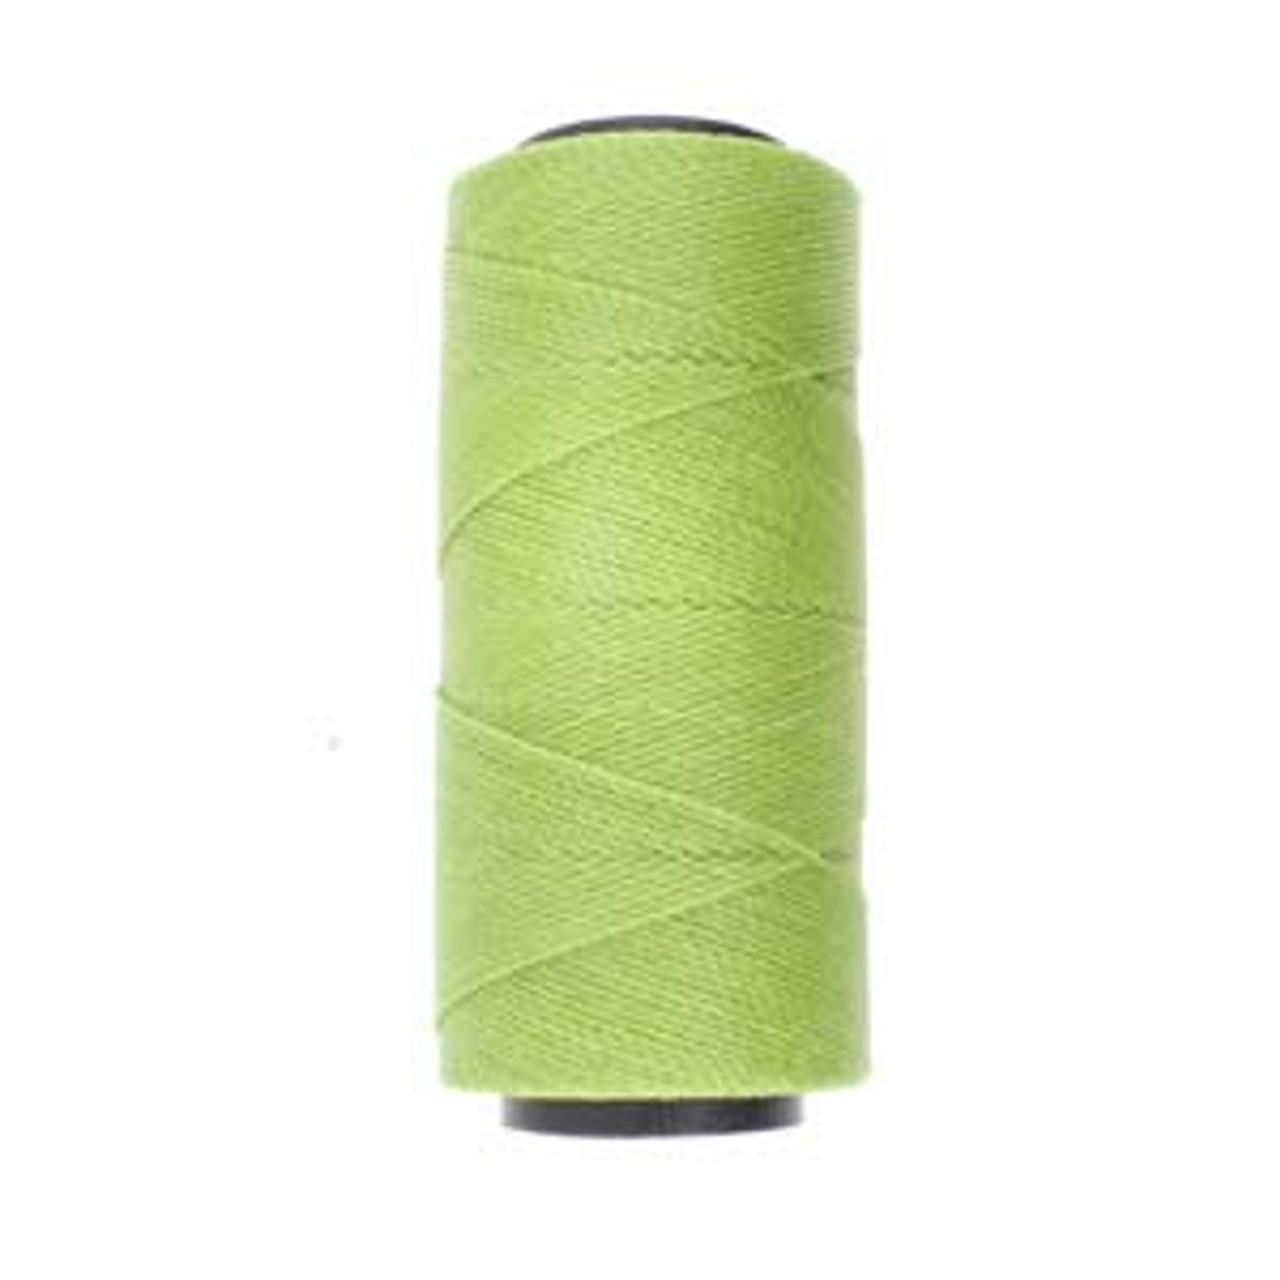 144yds 2 ply Lime Waxed Brazilian Cord